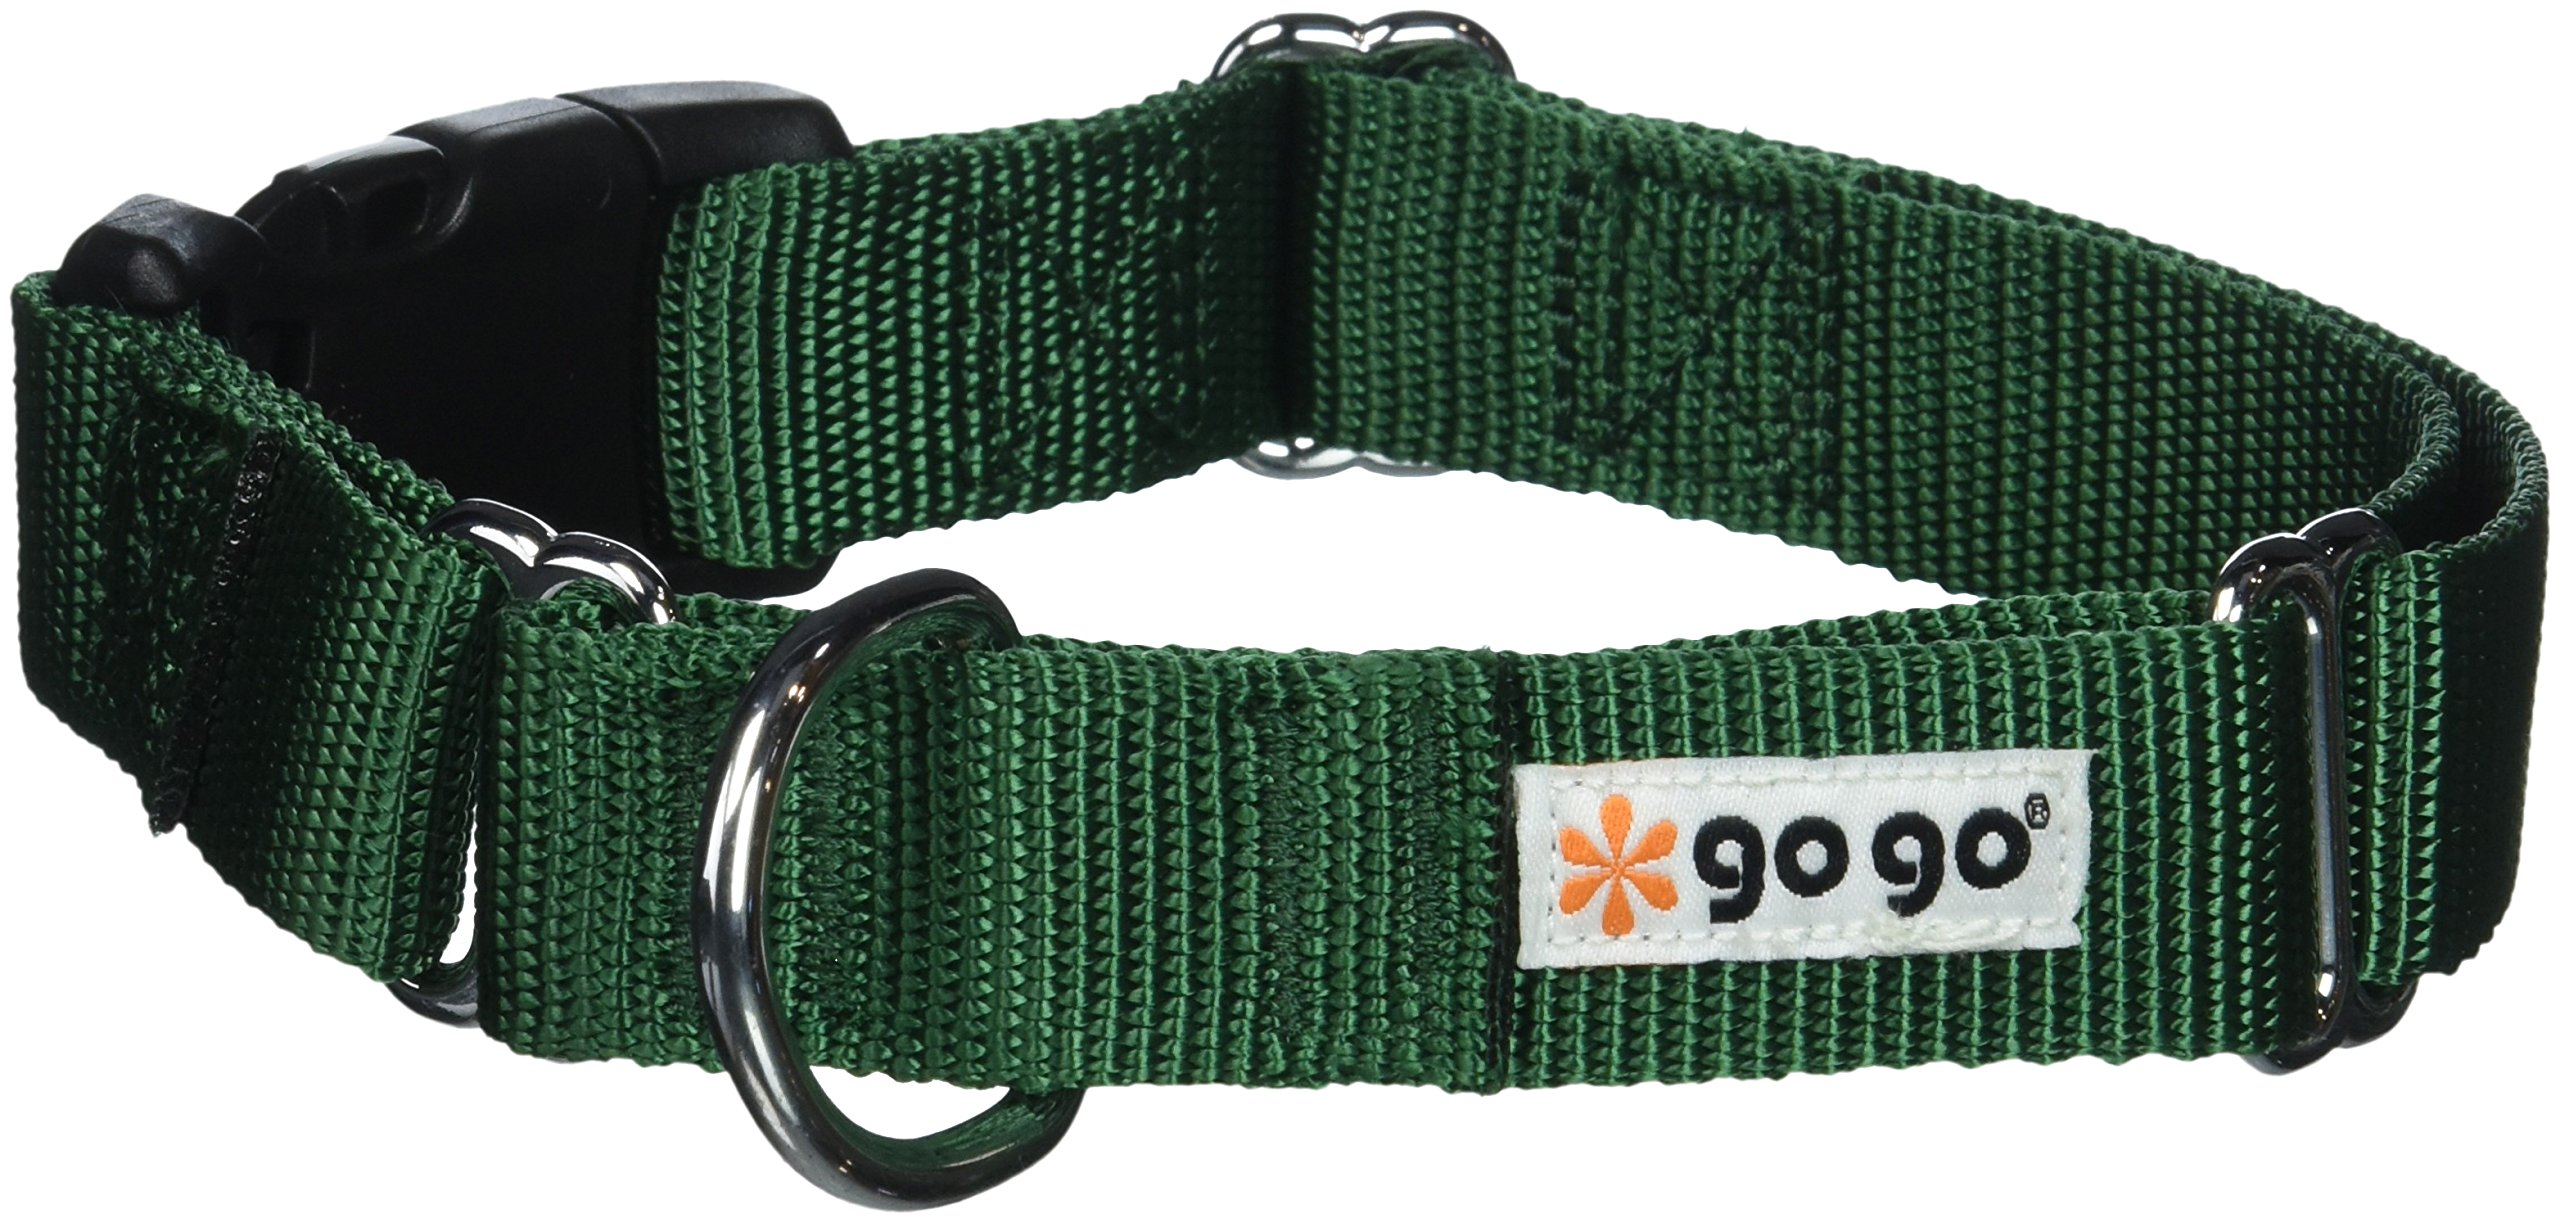 GoGo Pet Products Martingale Gentle Training Collar, Medium/Large, Hunter Green